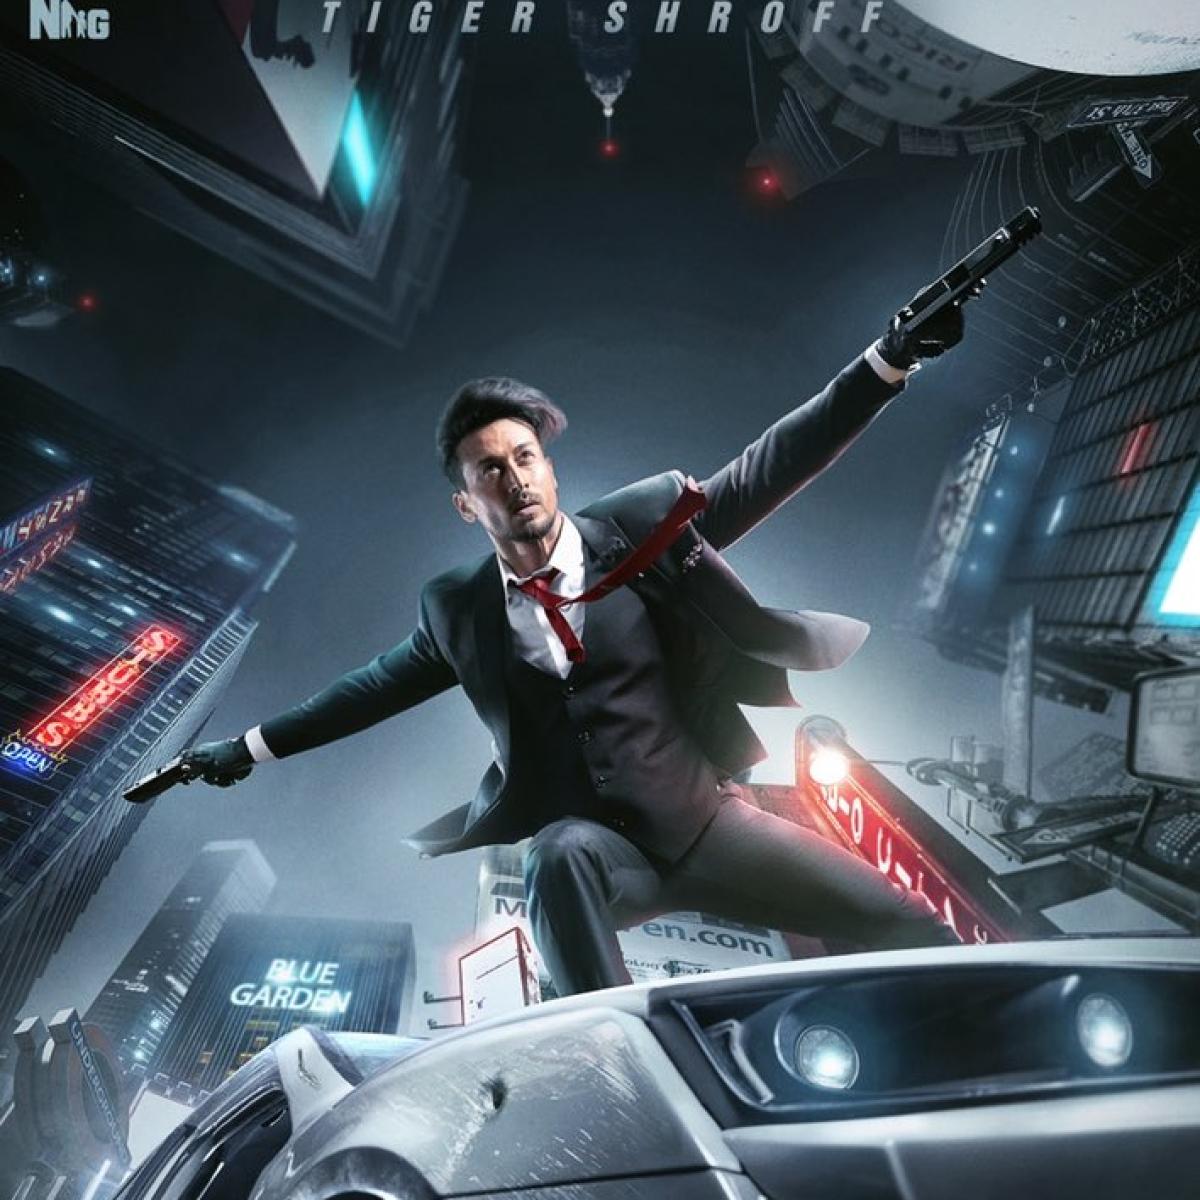 Tiger Shroff's 'Heropanti 2' to hit theatres on December 3